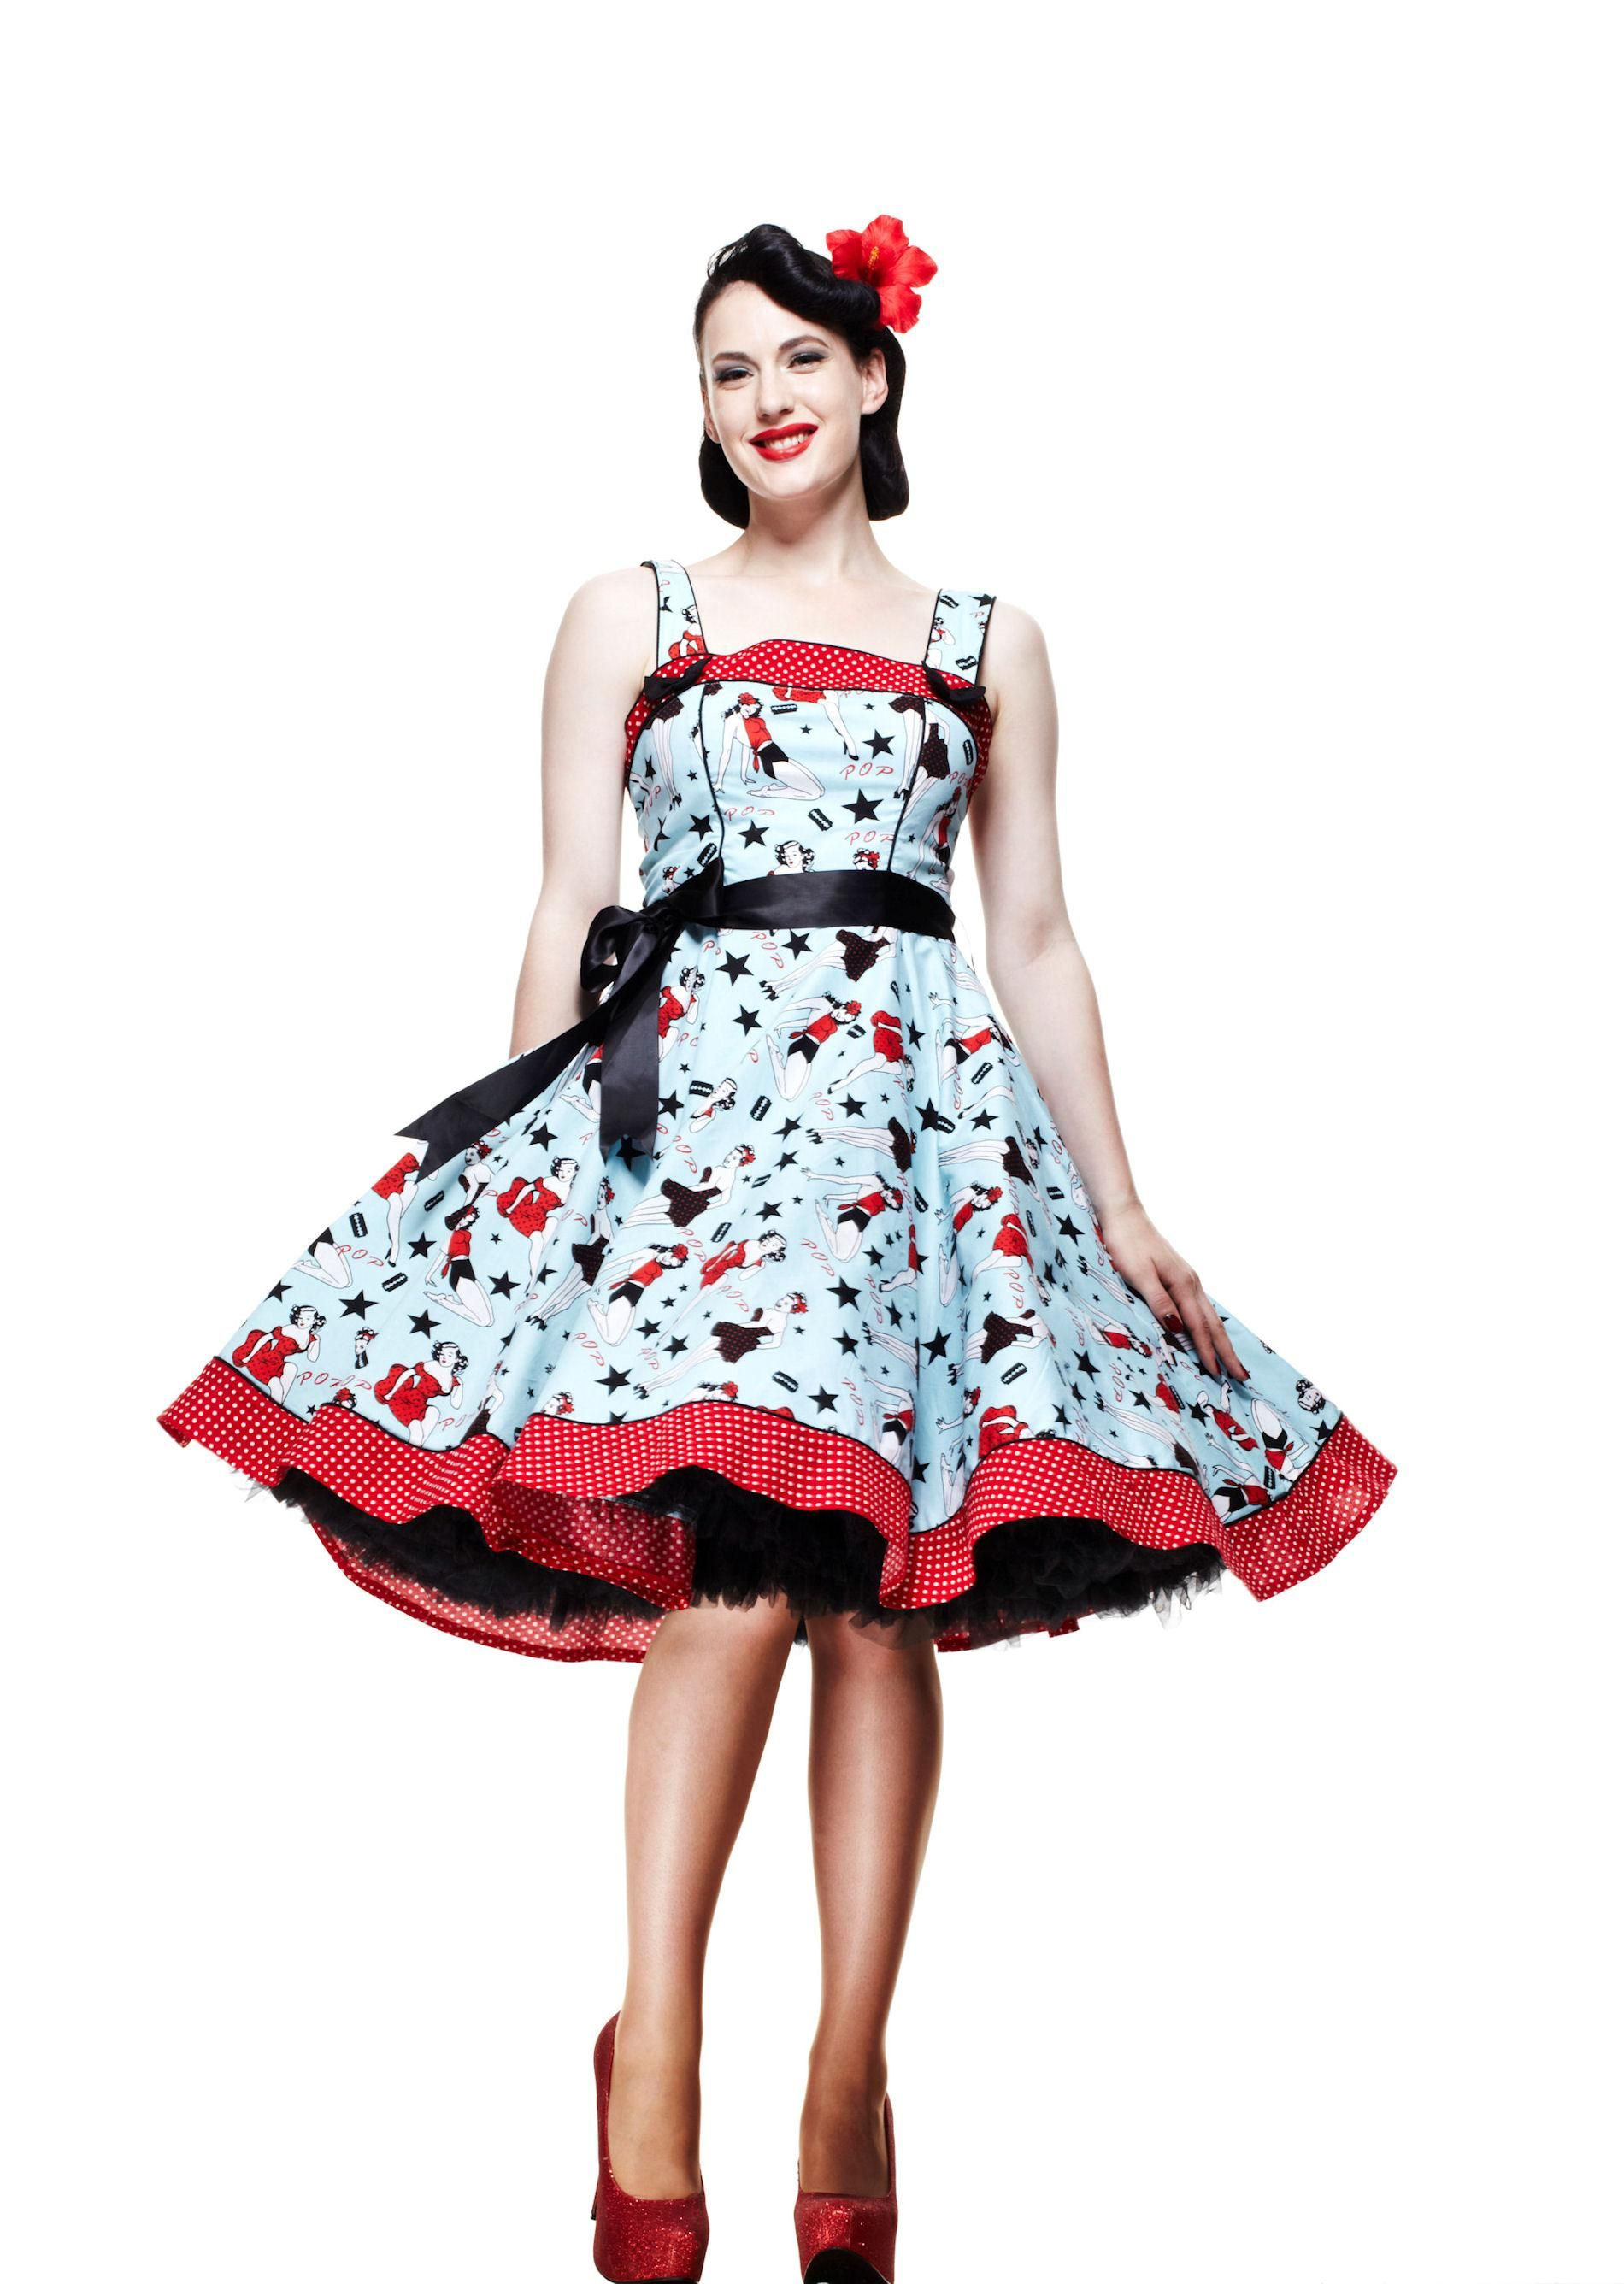 8b9895a6a175 Cute dress with pin-up girl print Rockabilly Fashion